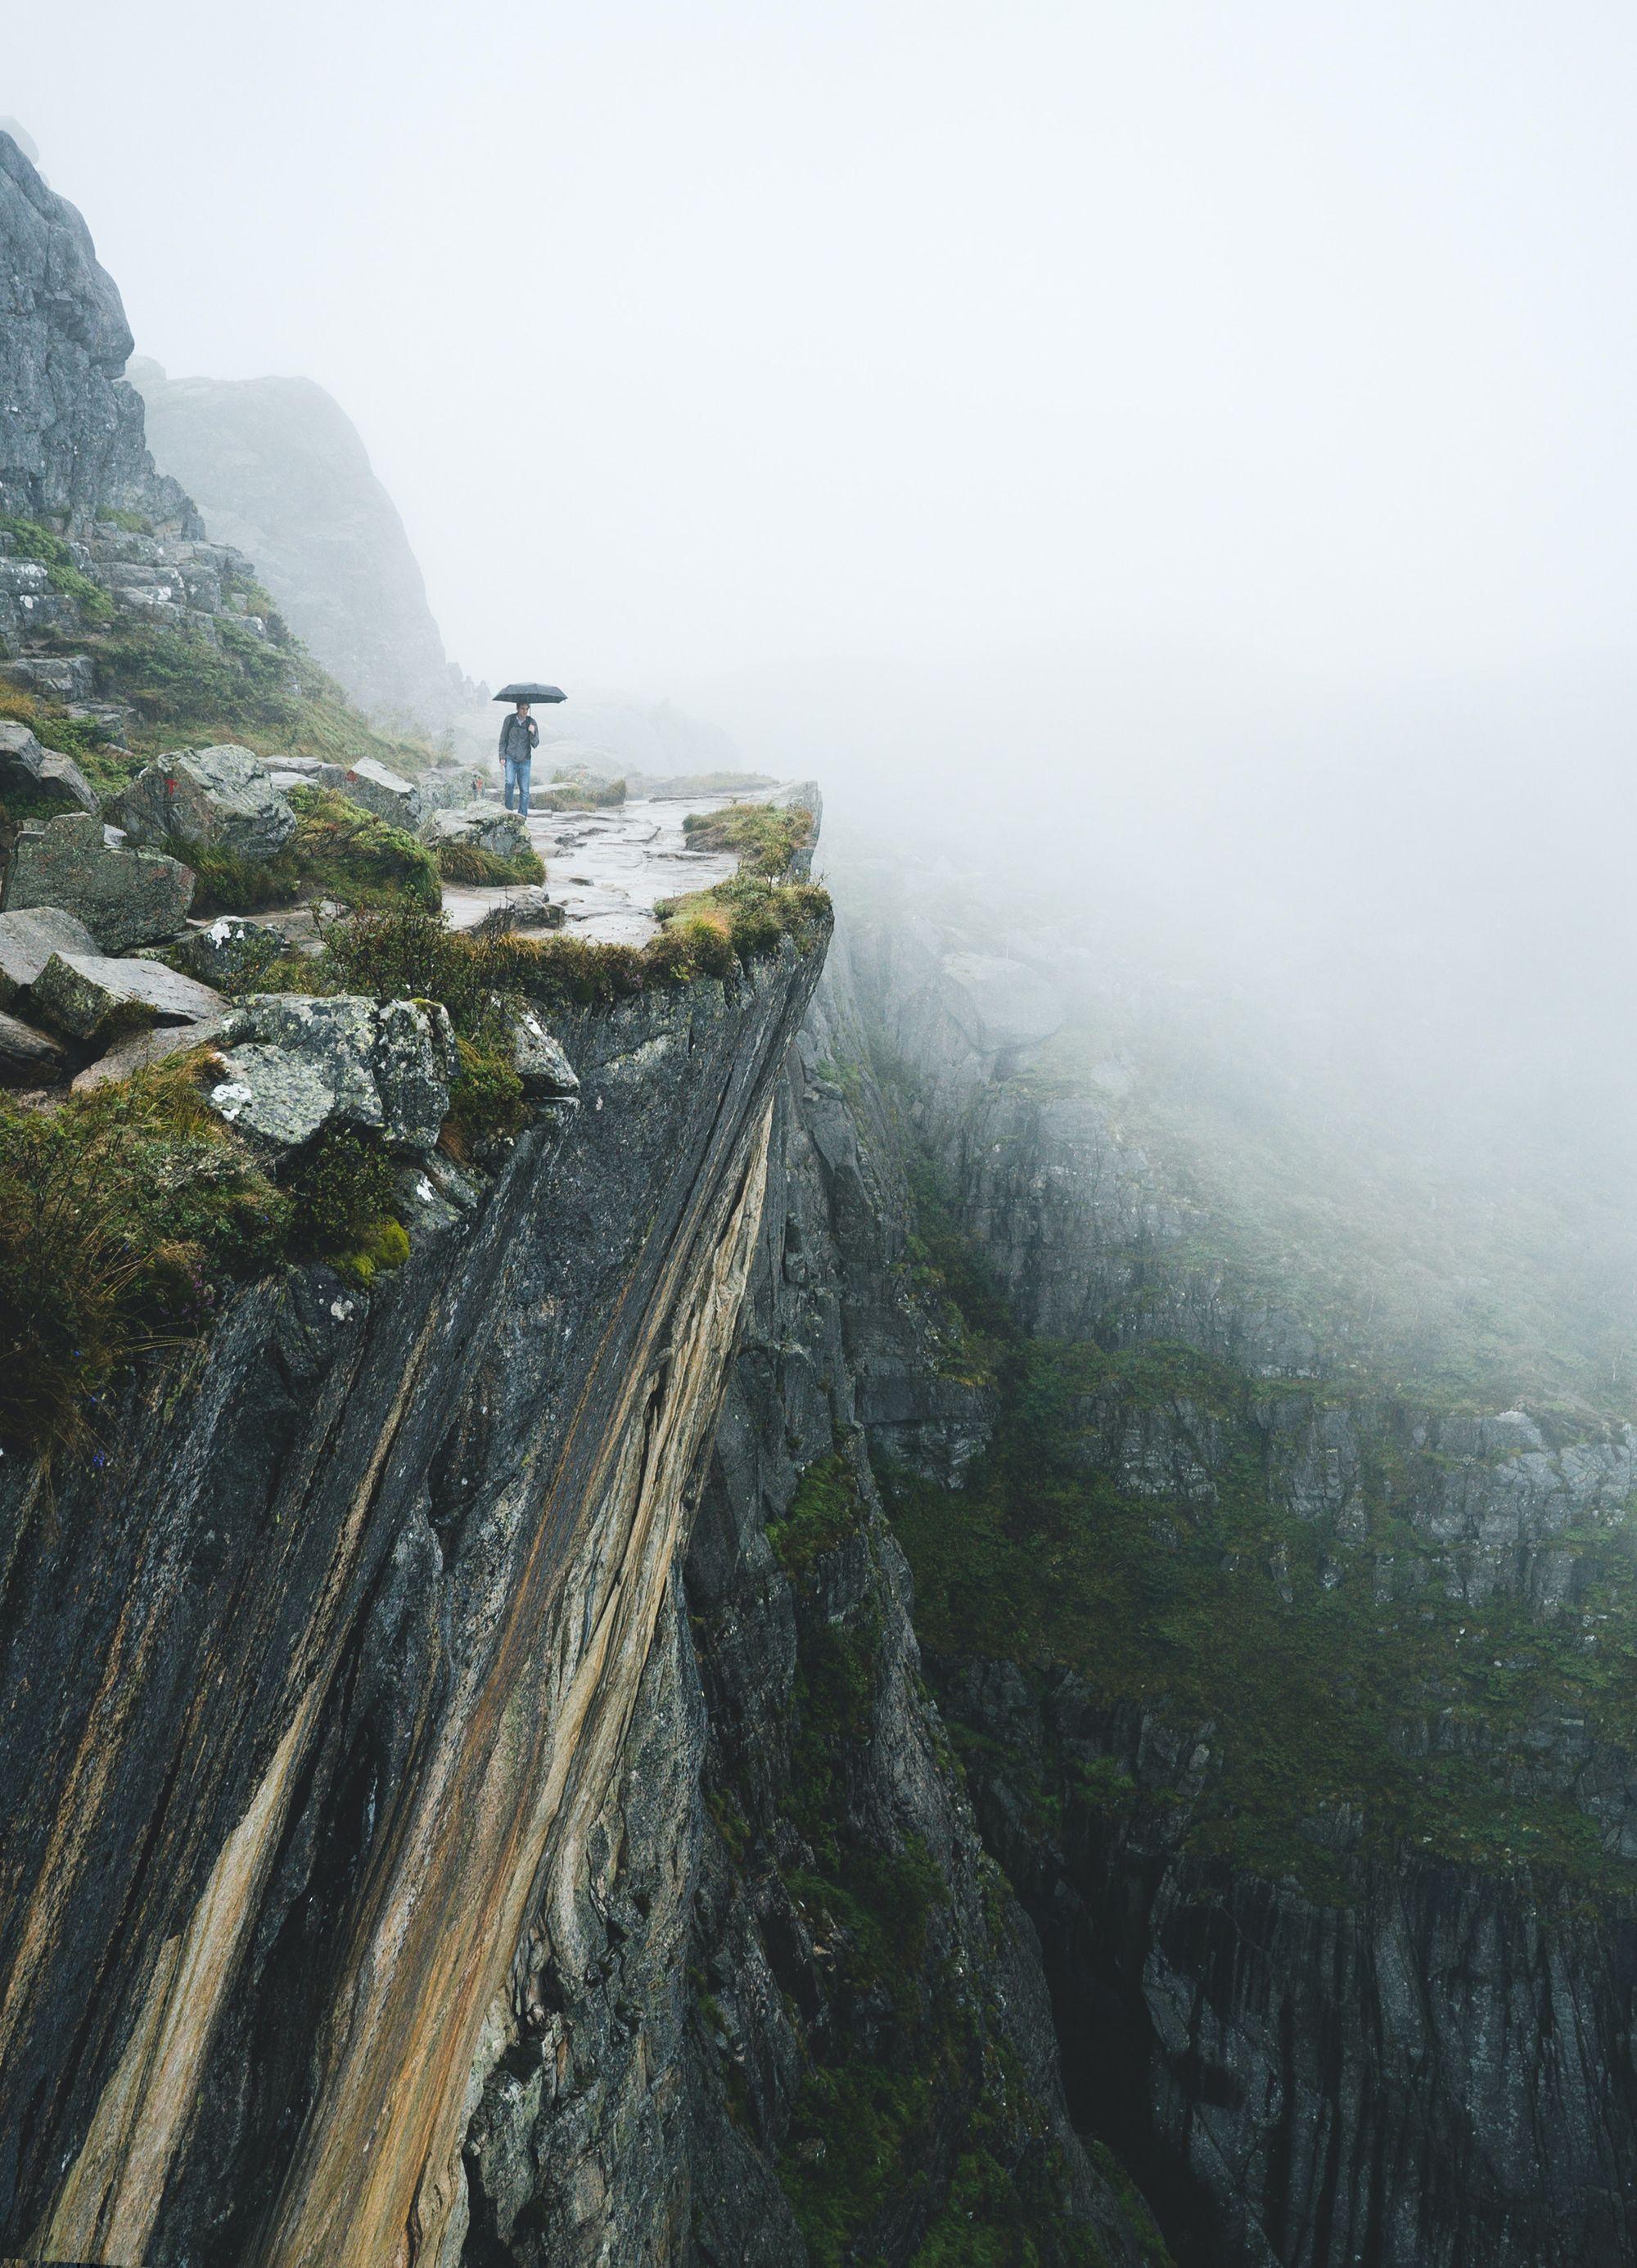 Fototips Norge